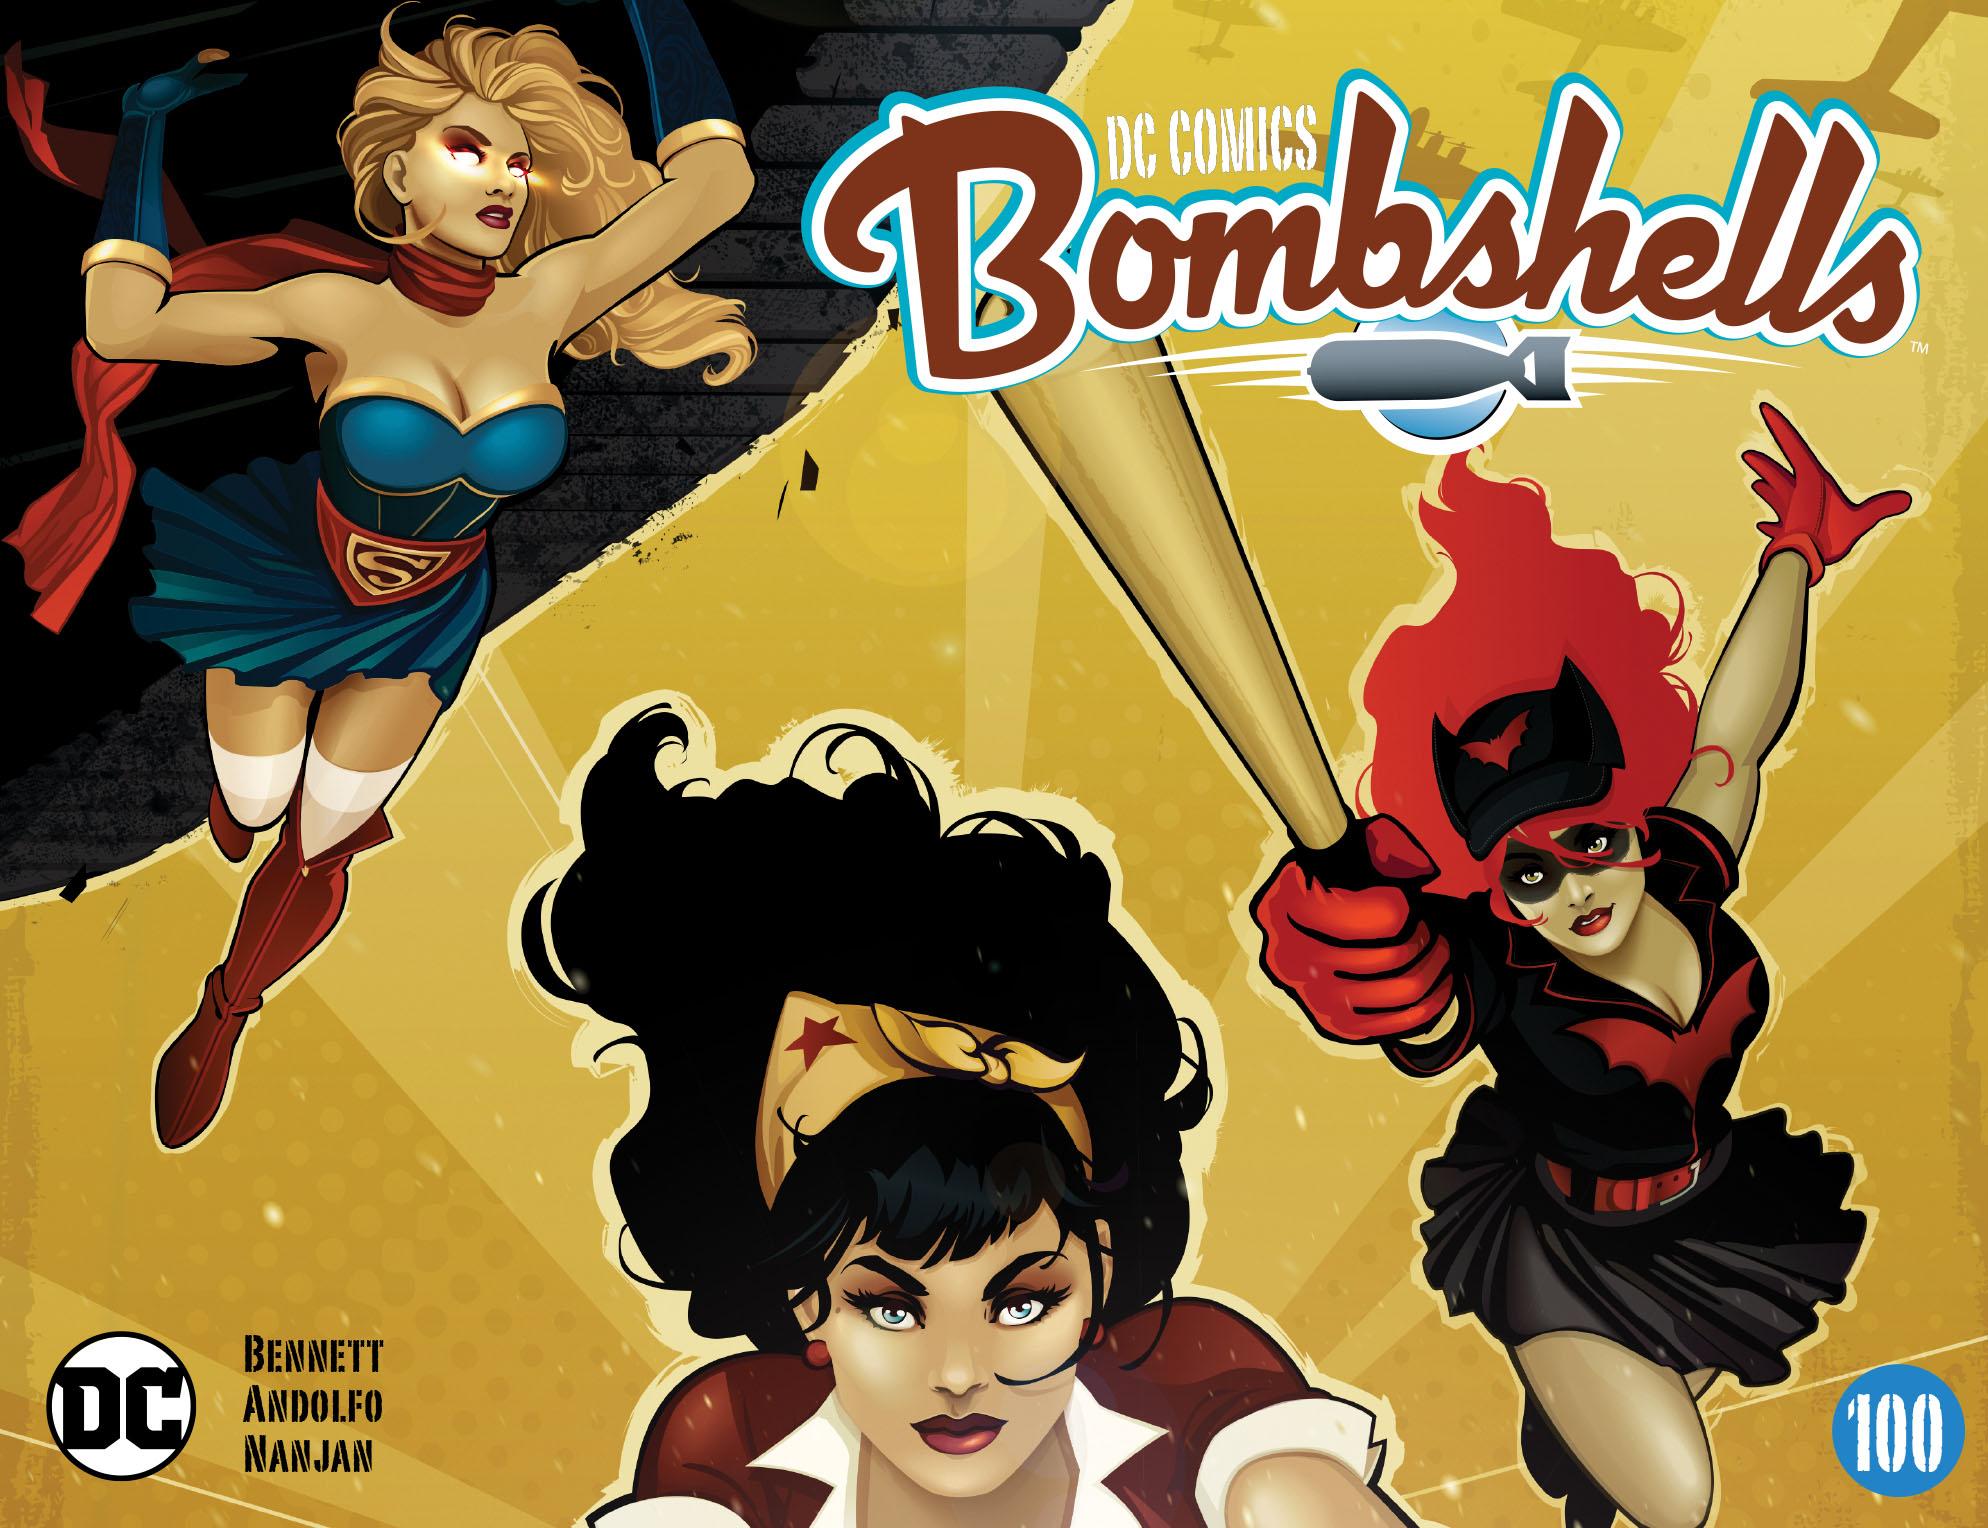 DC Comics: Bombshells 100 Page 1